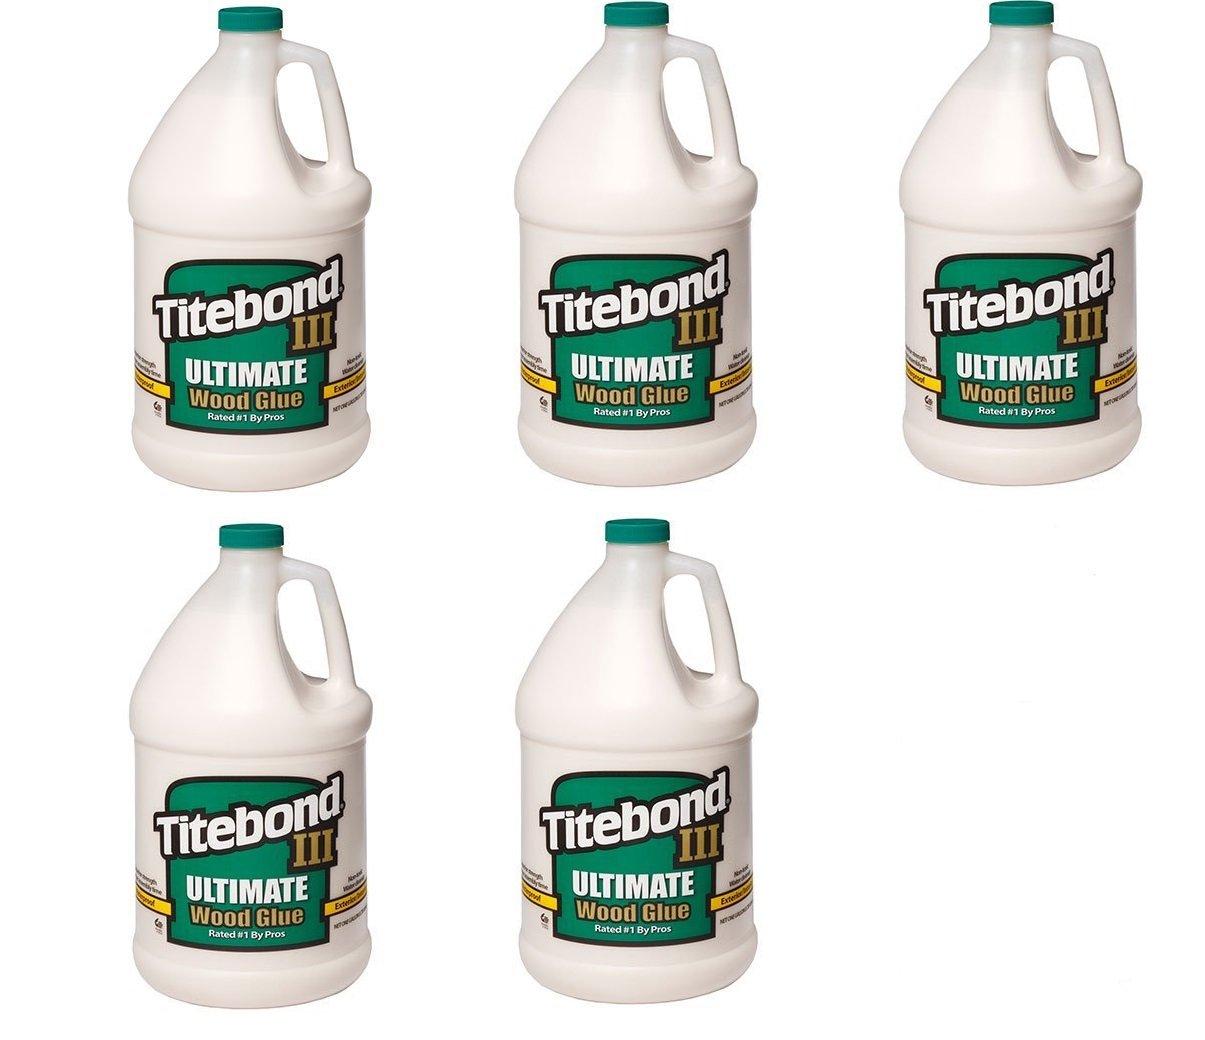 Franklin International 1416 Titebond-3 Ultimate Wood Glue, 1-Gallon (5 X 1 GALLON)